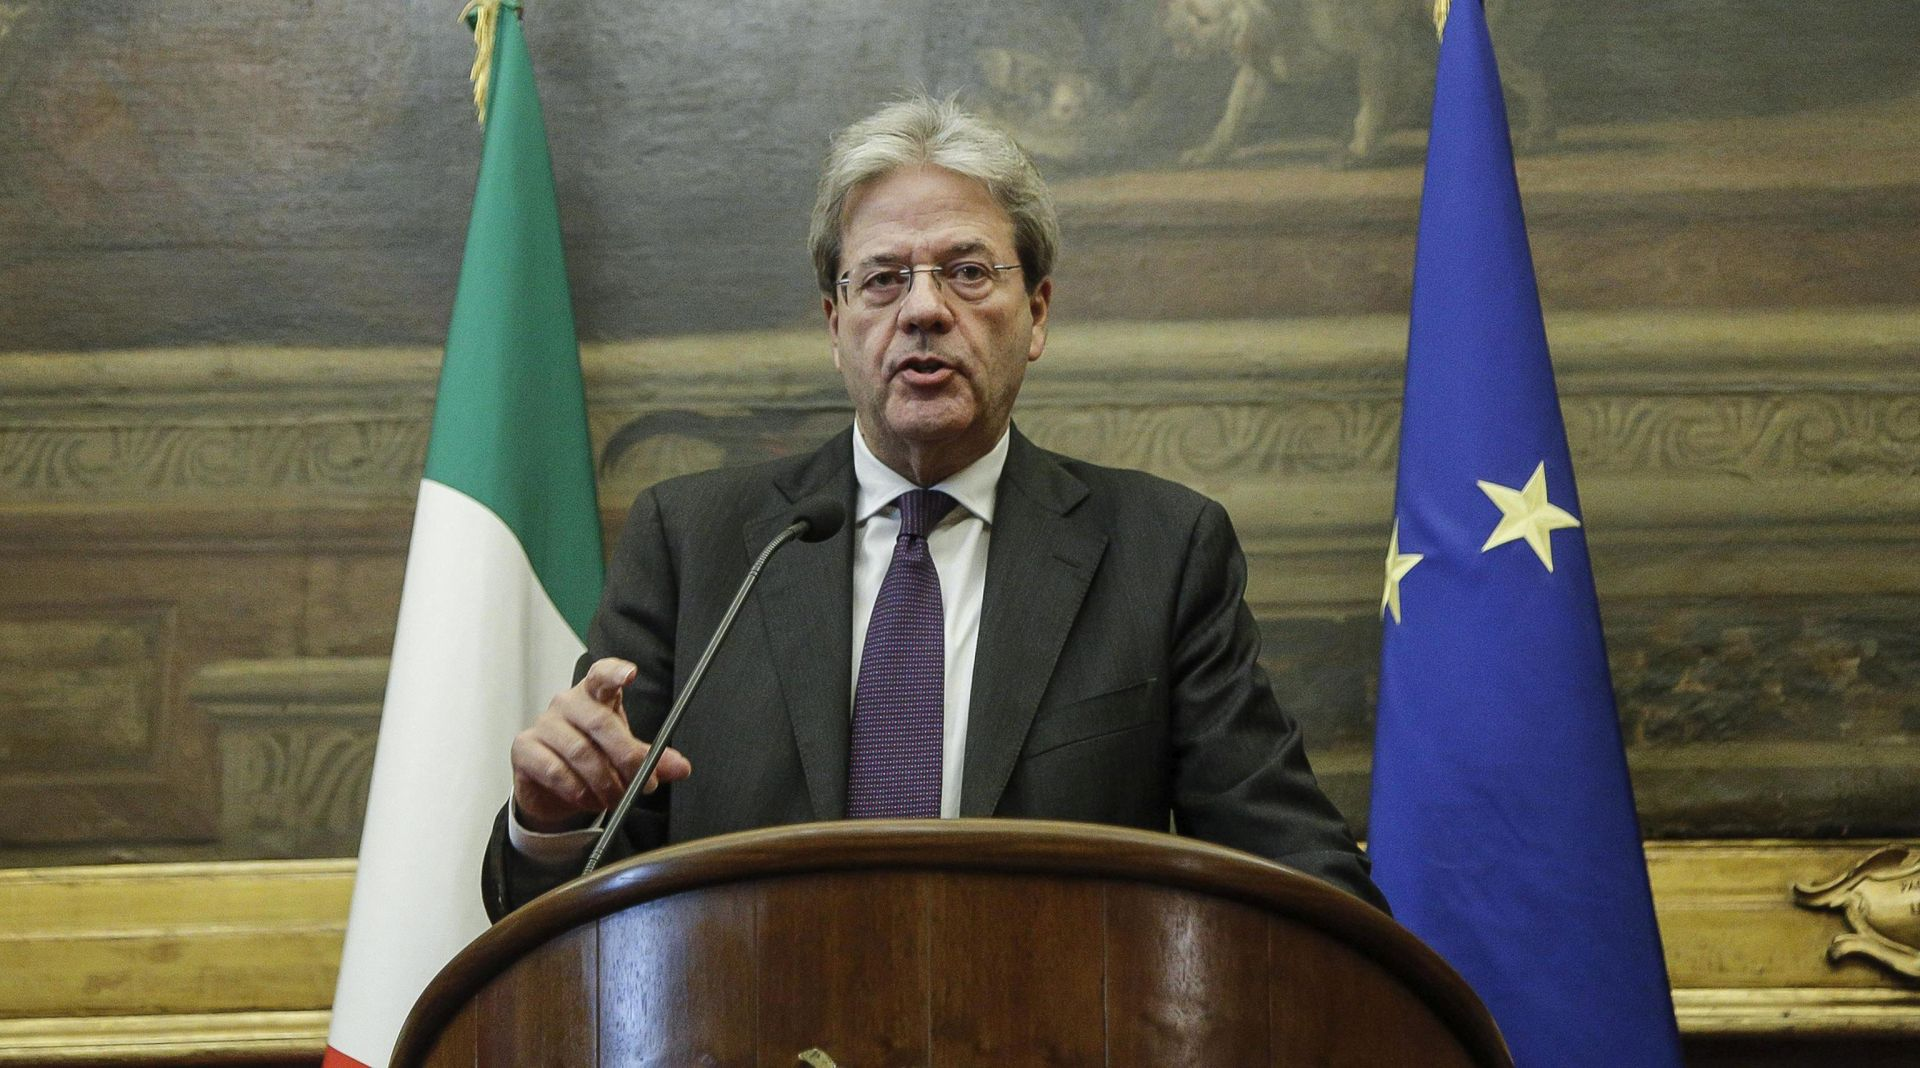 Raspušten talijanski parlament, izbori 4. ožujka